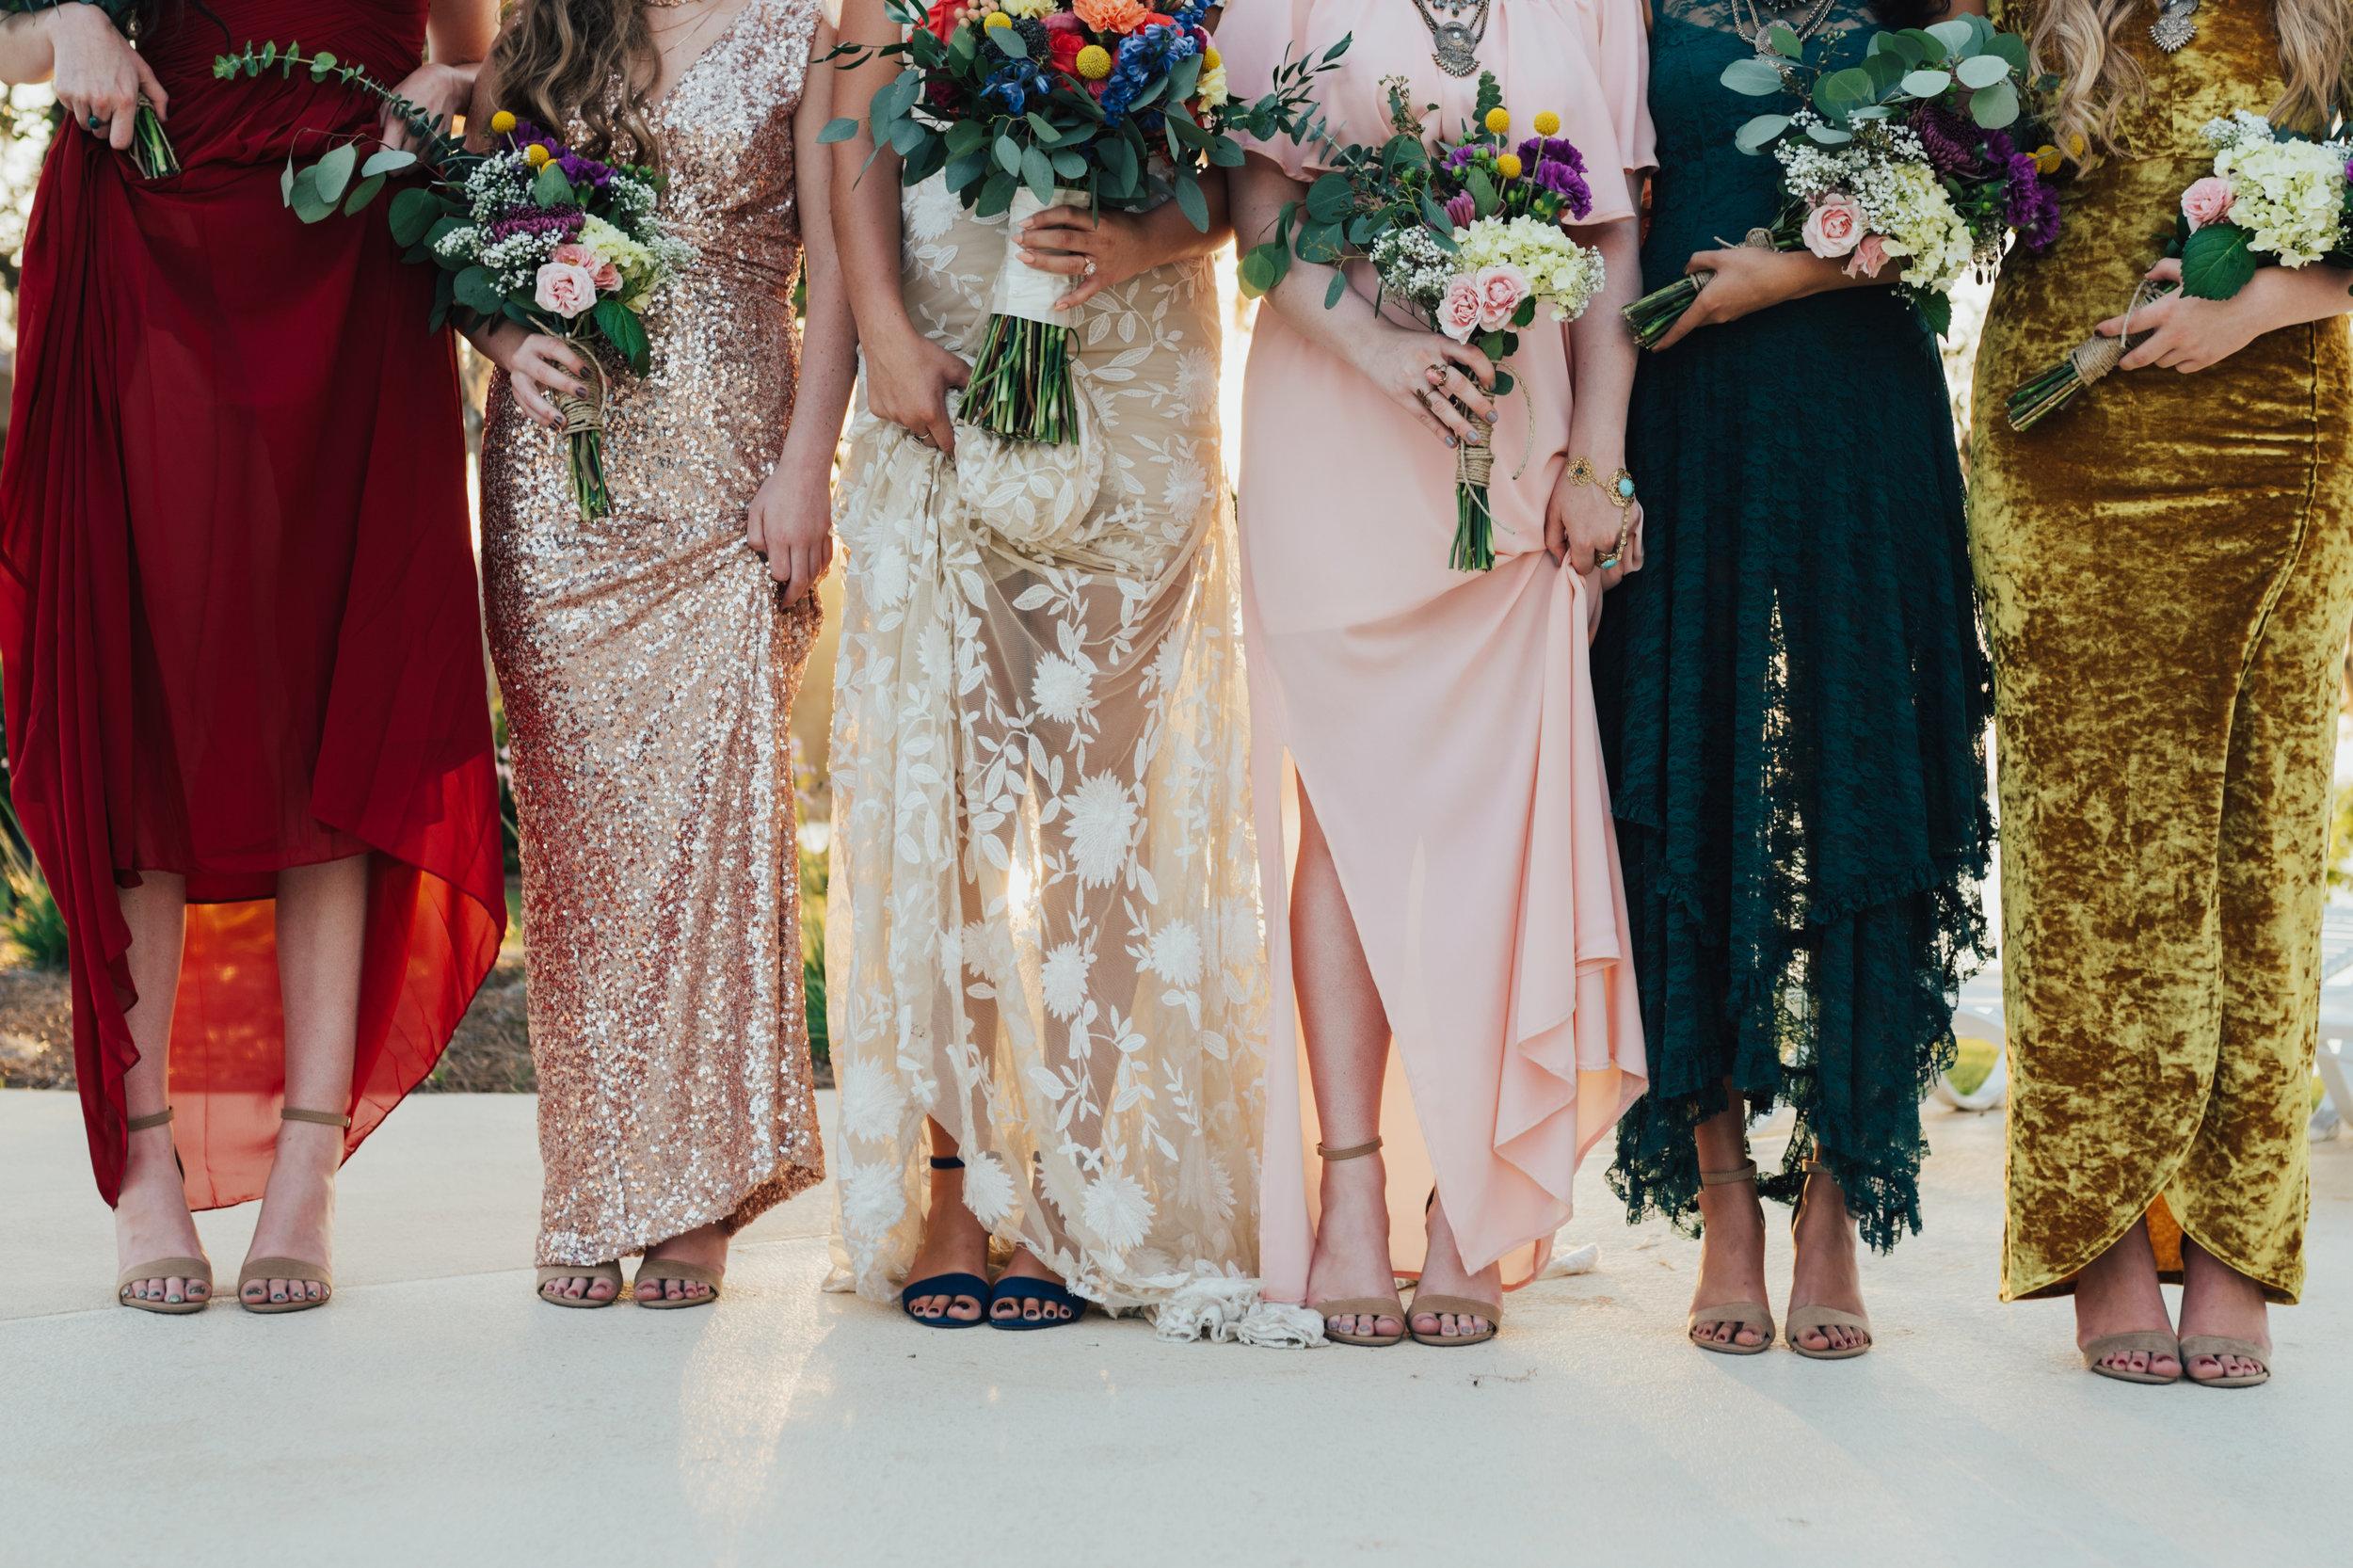 zayda-collin-panama-city-wedding-photography-trippy-bohemian-lisa-frank-wedding-group-shots-77.jpg